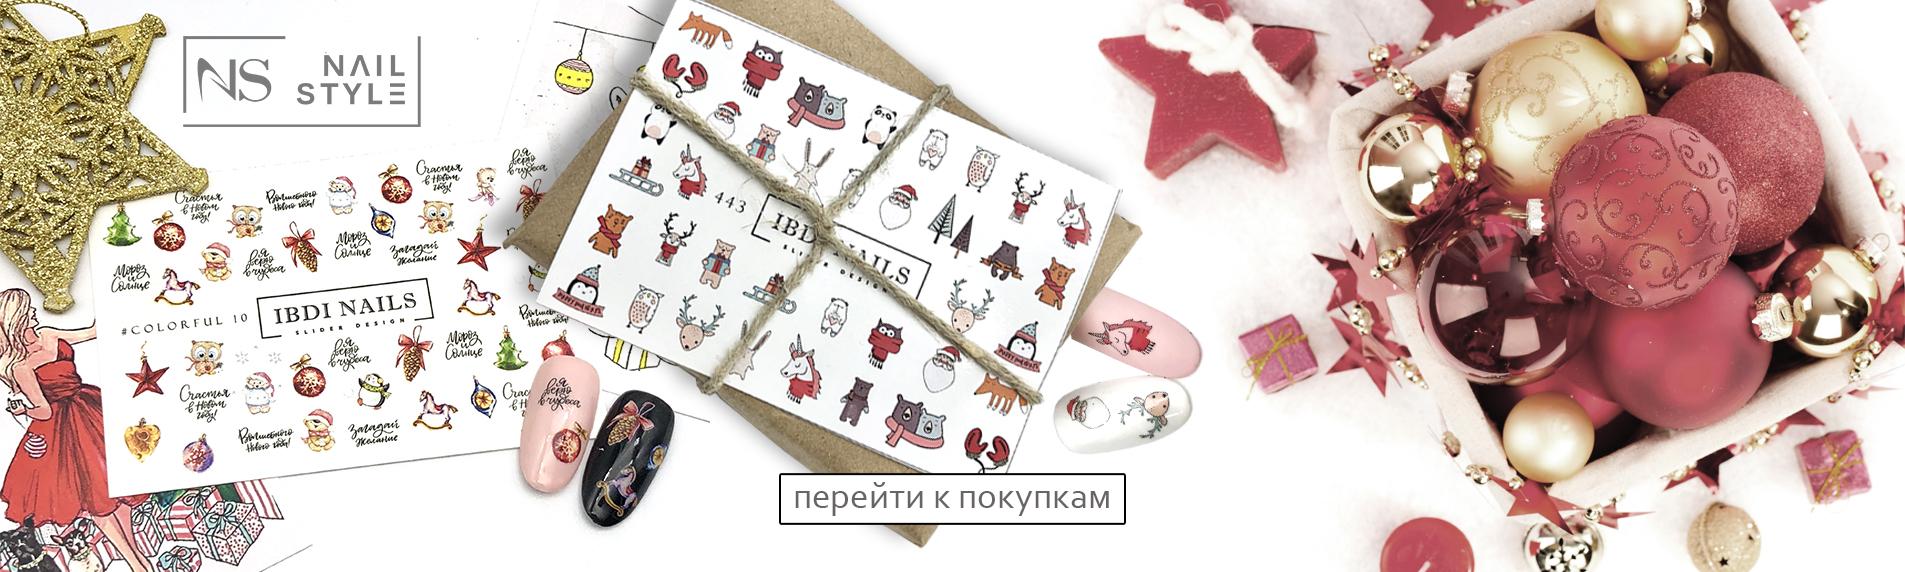 IBDI NAILS банер 01